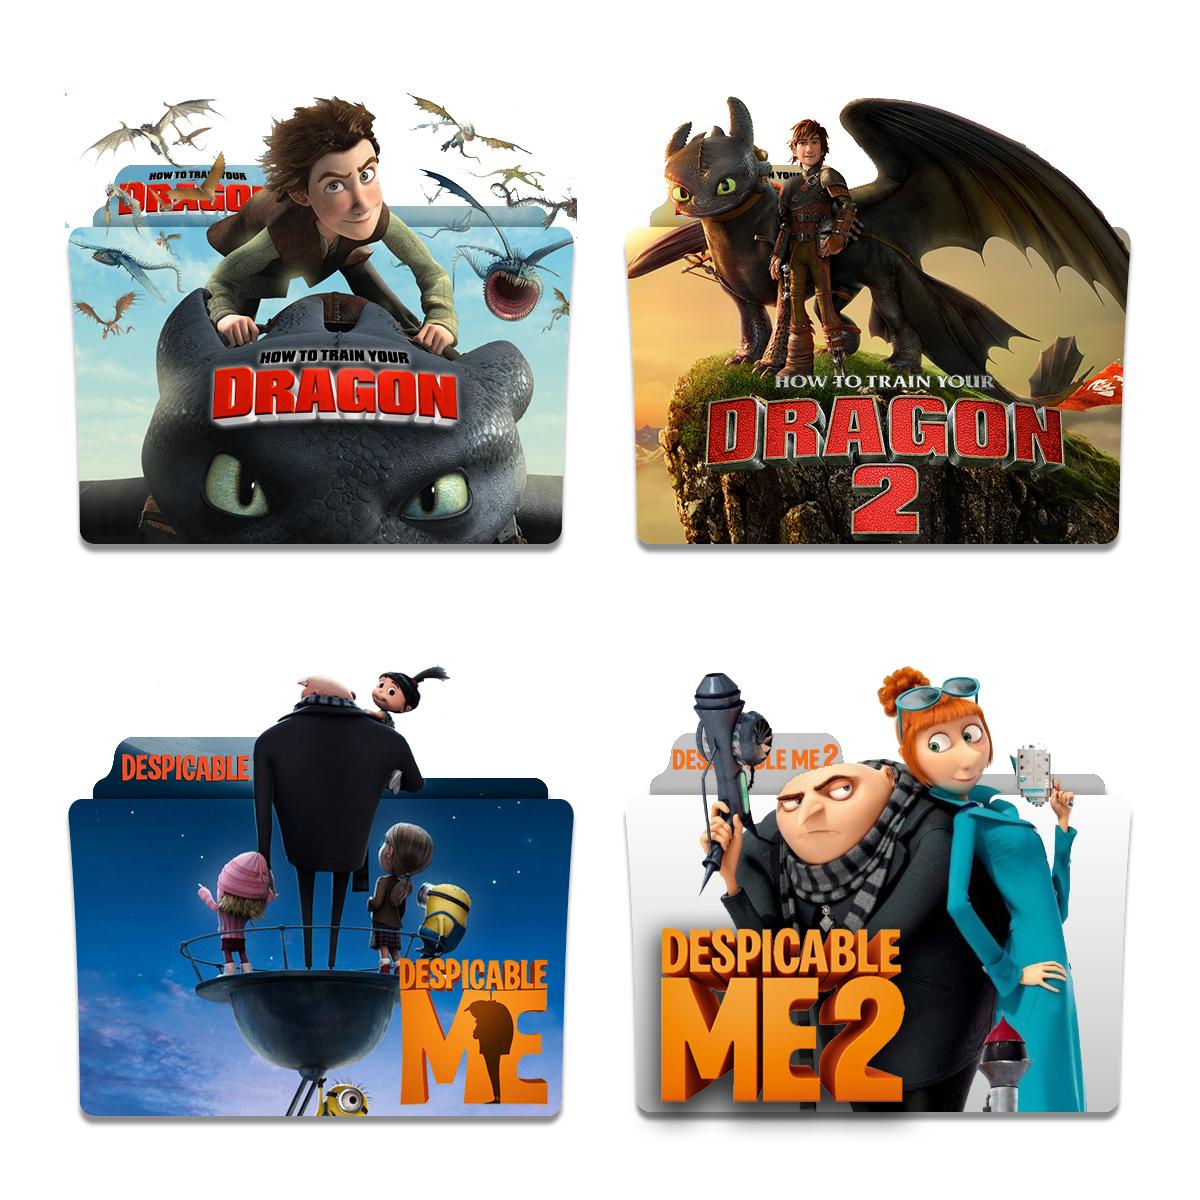 Animation Movies Folder Icon By Kingjith Animation Movies Folder Icon By  Kingjith